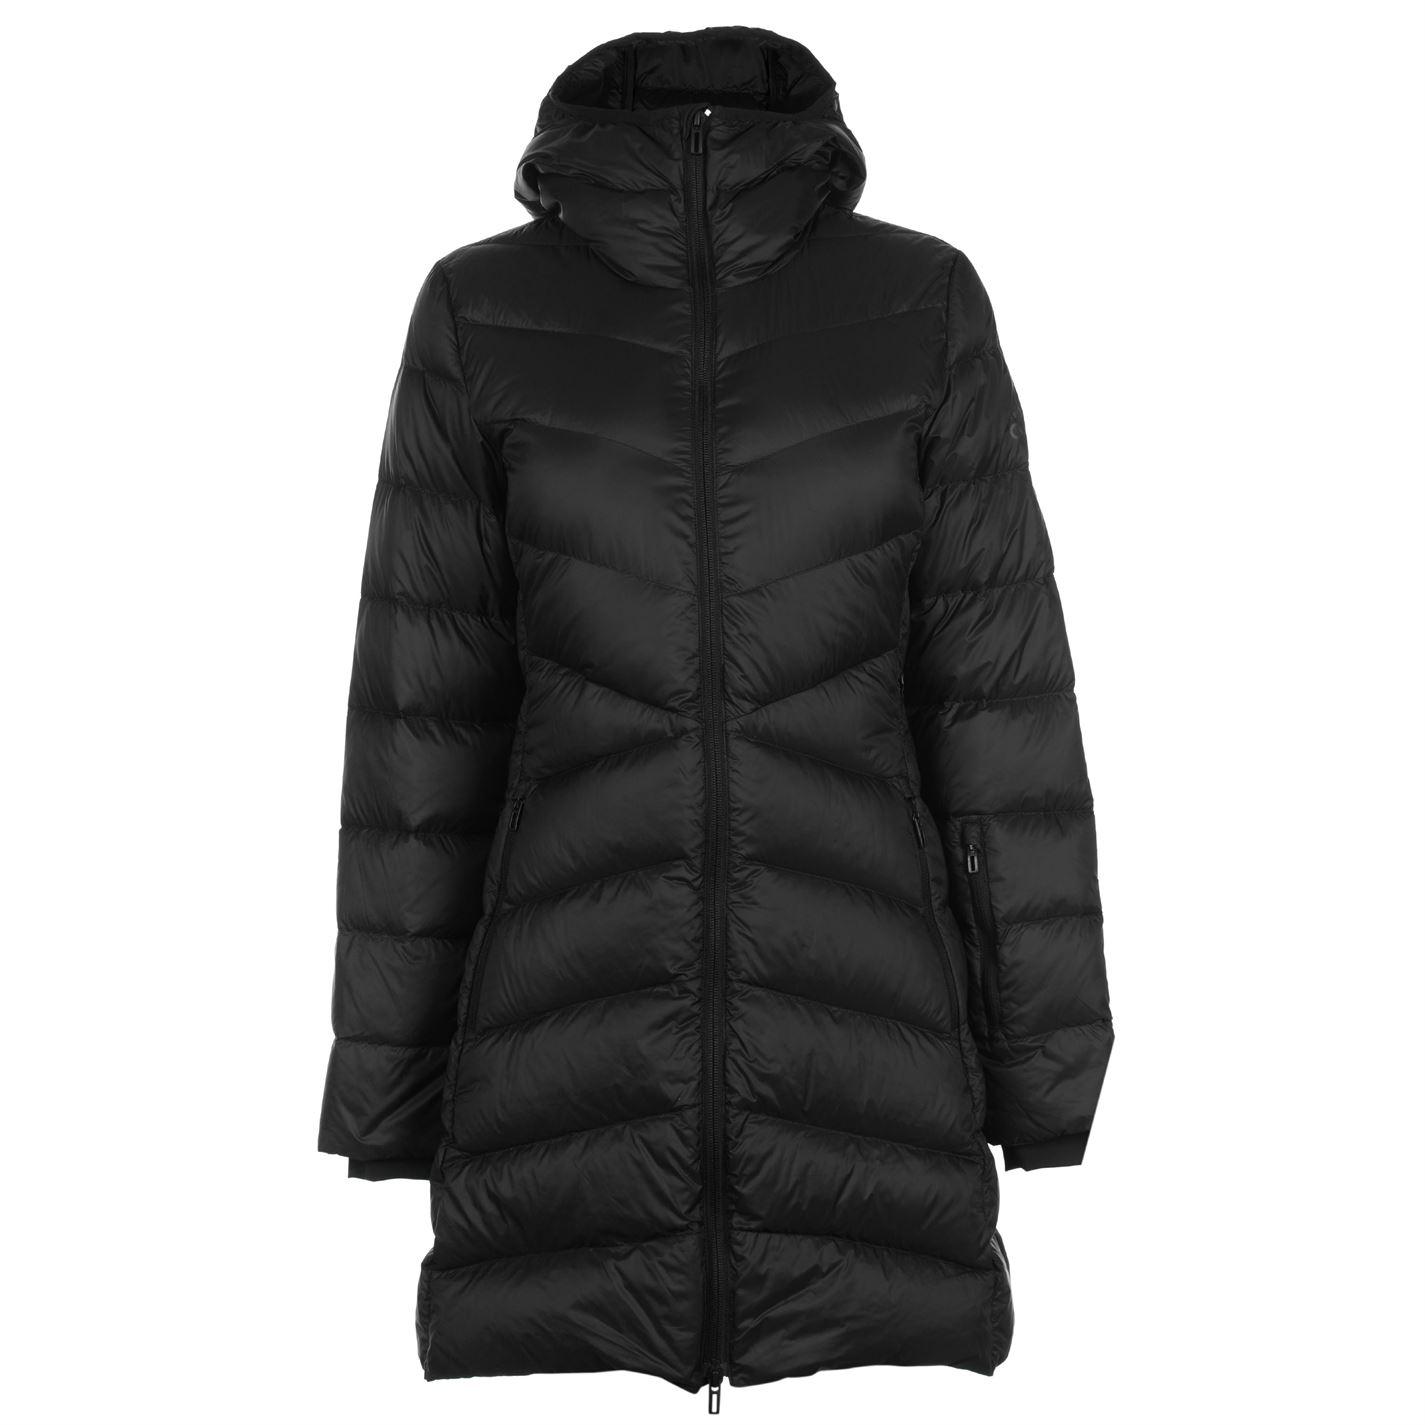 Adidas NUVIC Jacket Ladies